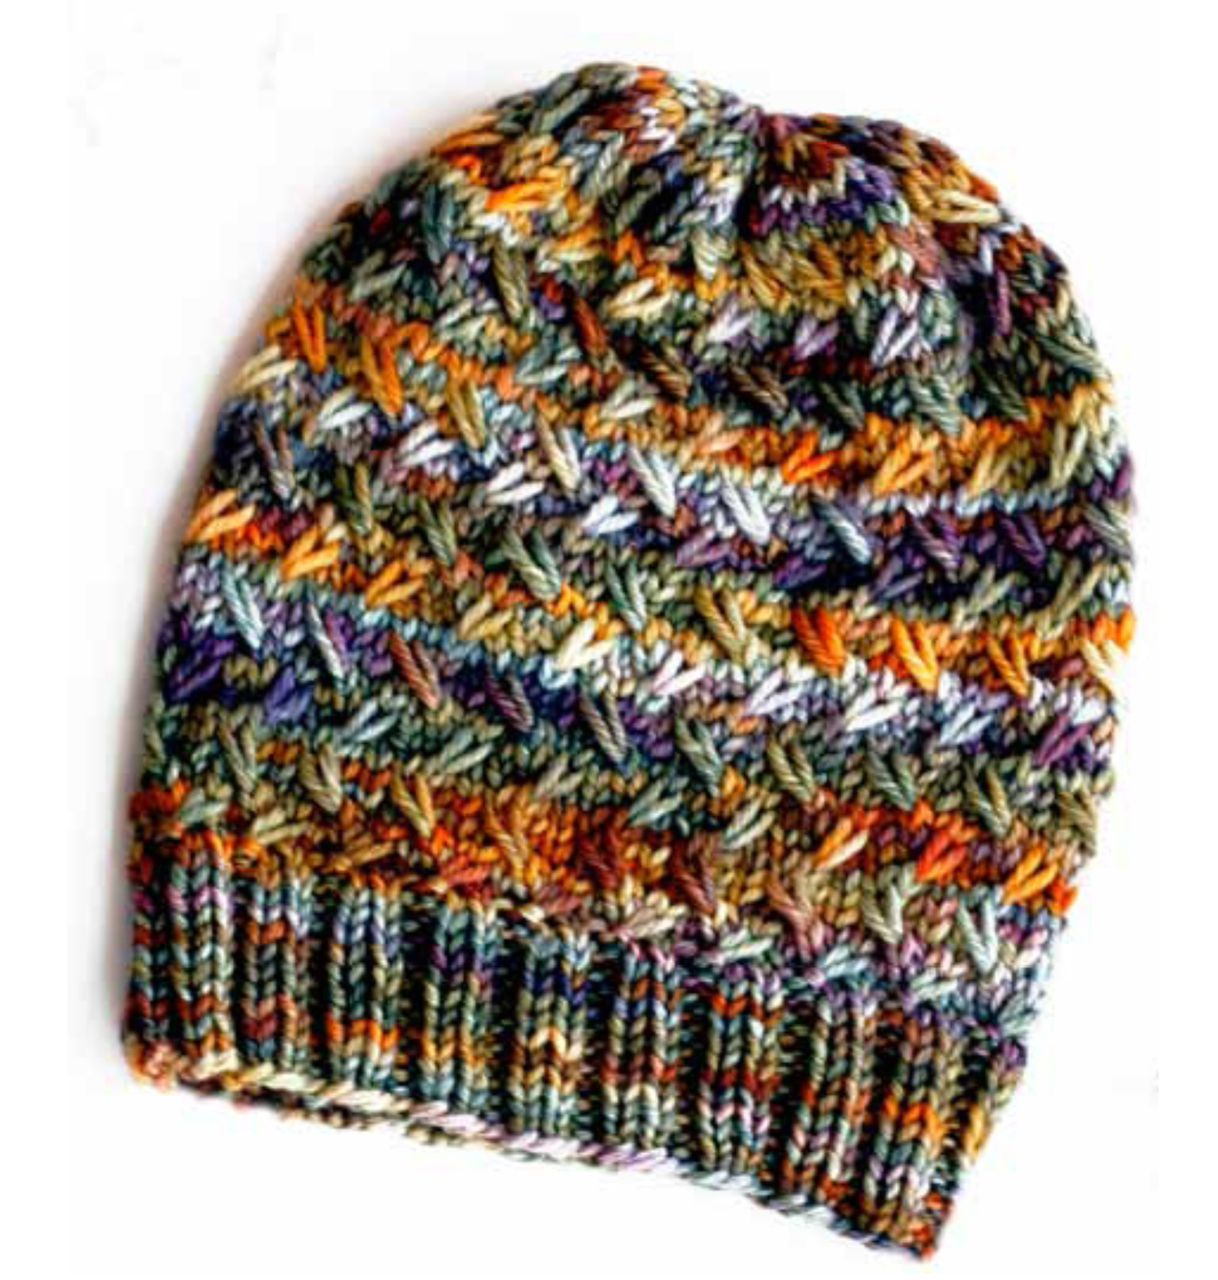 Muir woods beanie loomed loom knitting pinterest loom muir woods beanie on a knitting loom dt1010fo